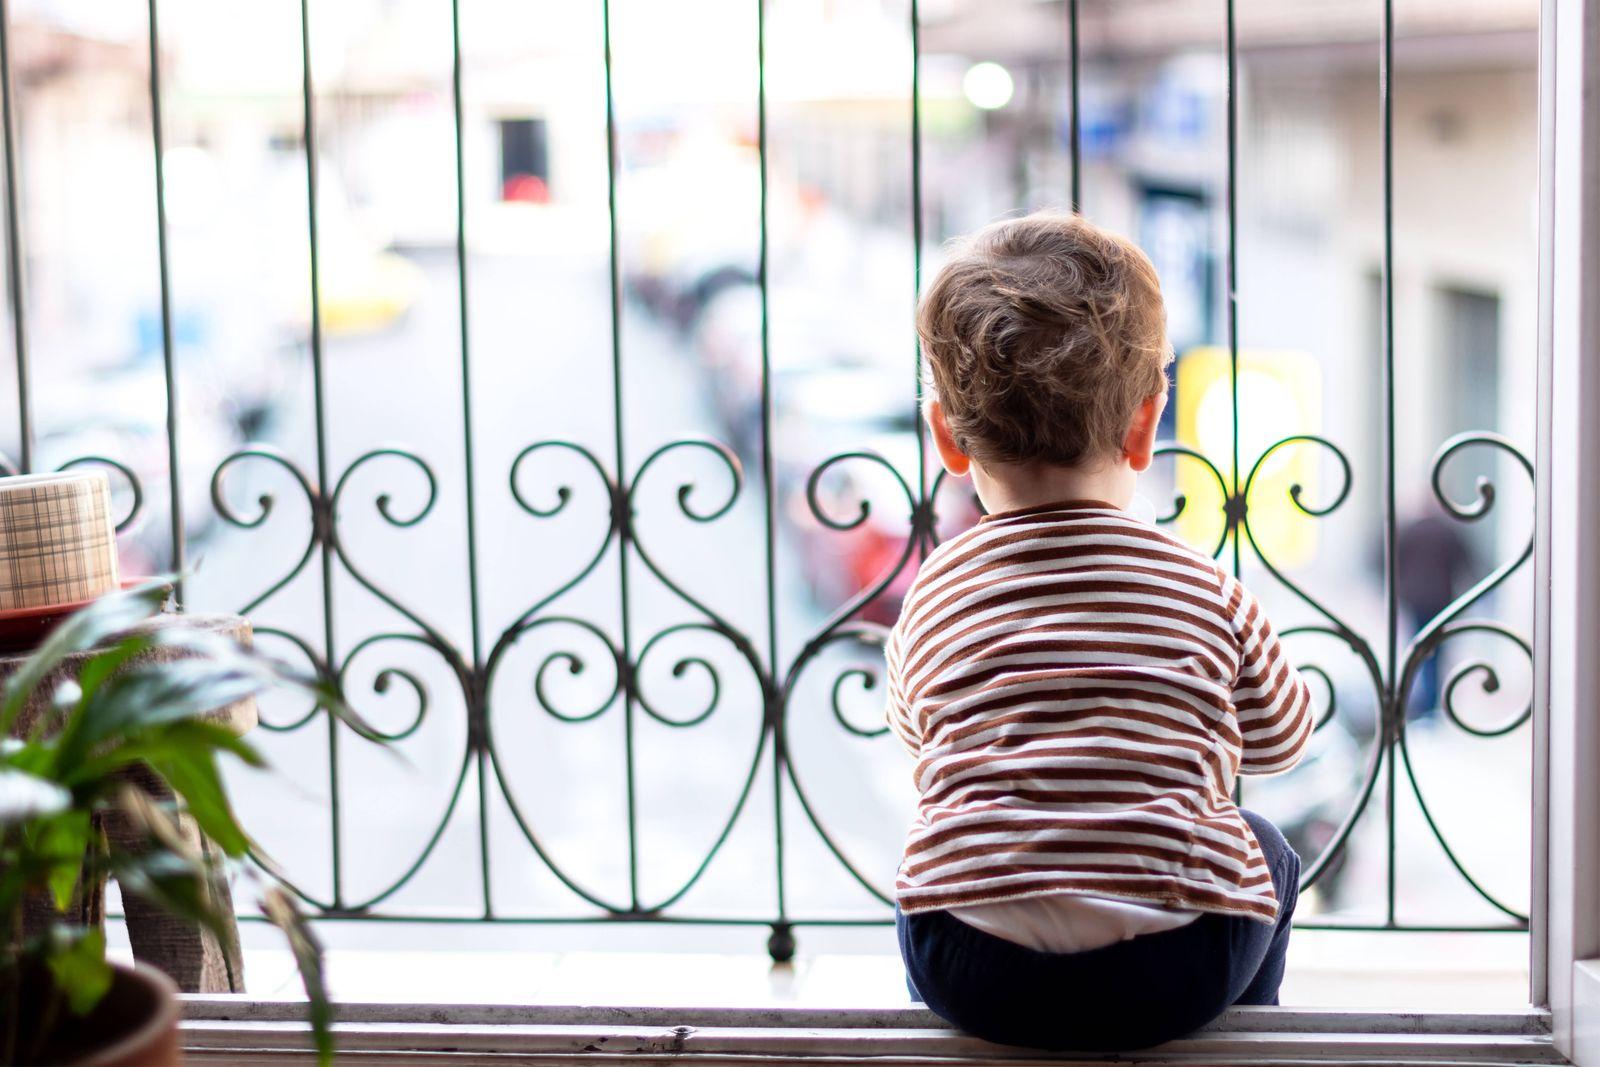 Bored kid staring off the balcony in quarantine. Vitoria-Gasteiz, PV, Spain PUBLICATIONxINxGERxSUIxAUTxONLY CR_JGRUEB20